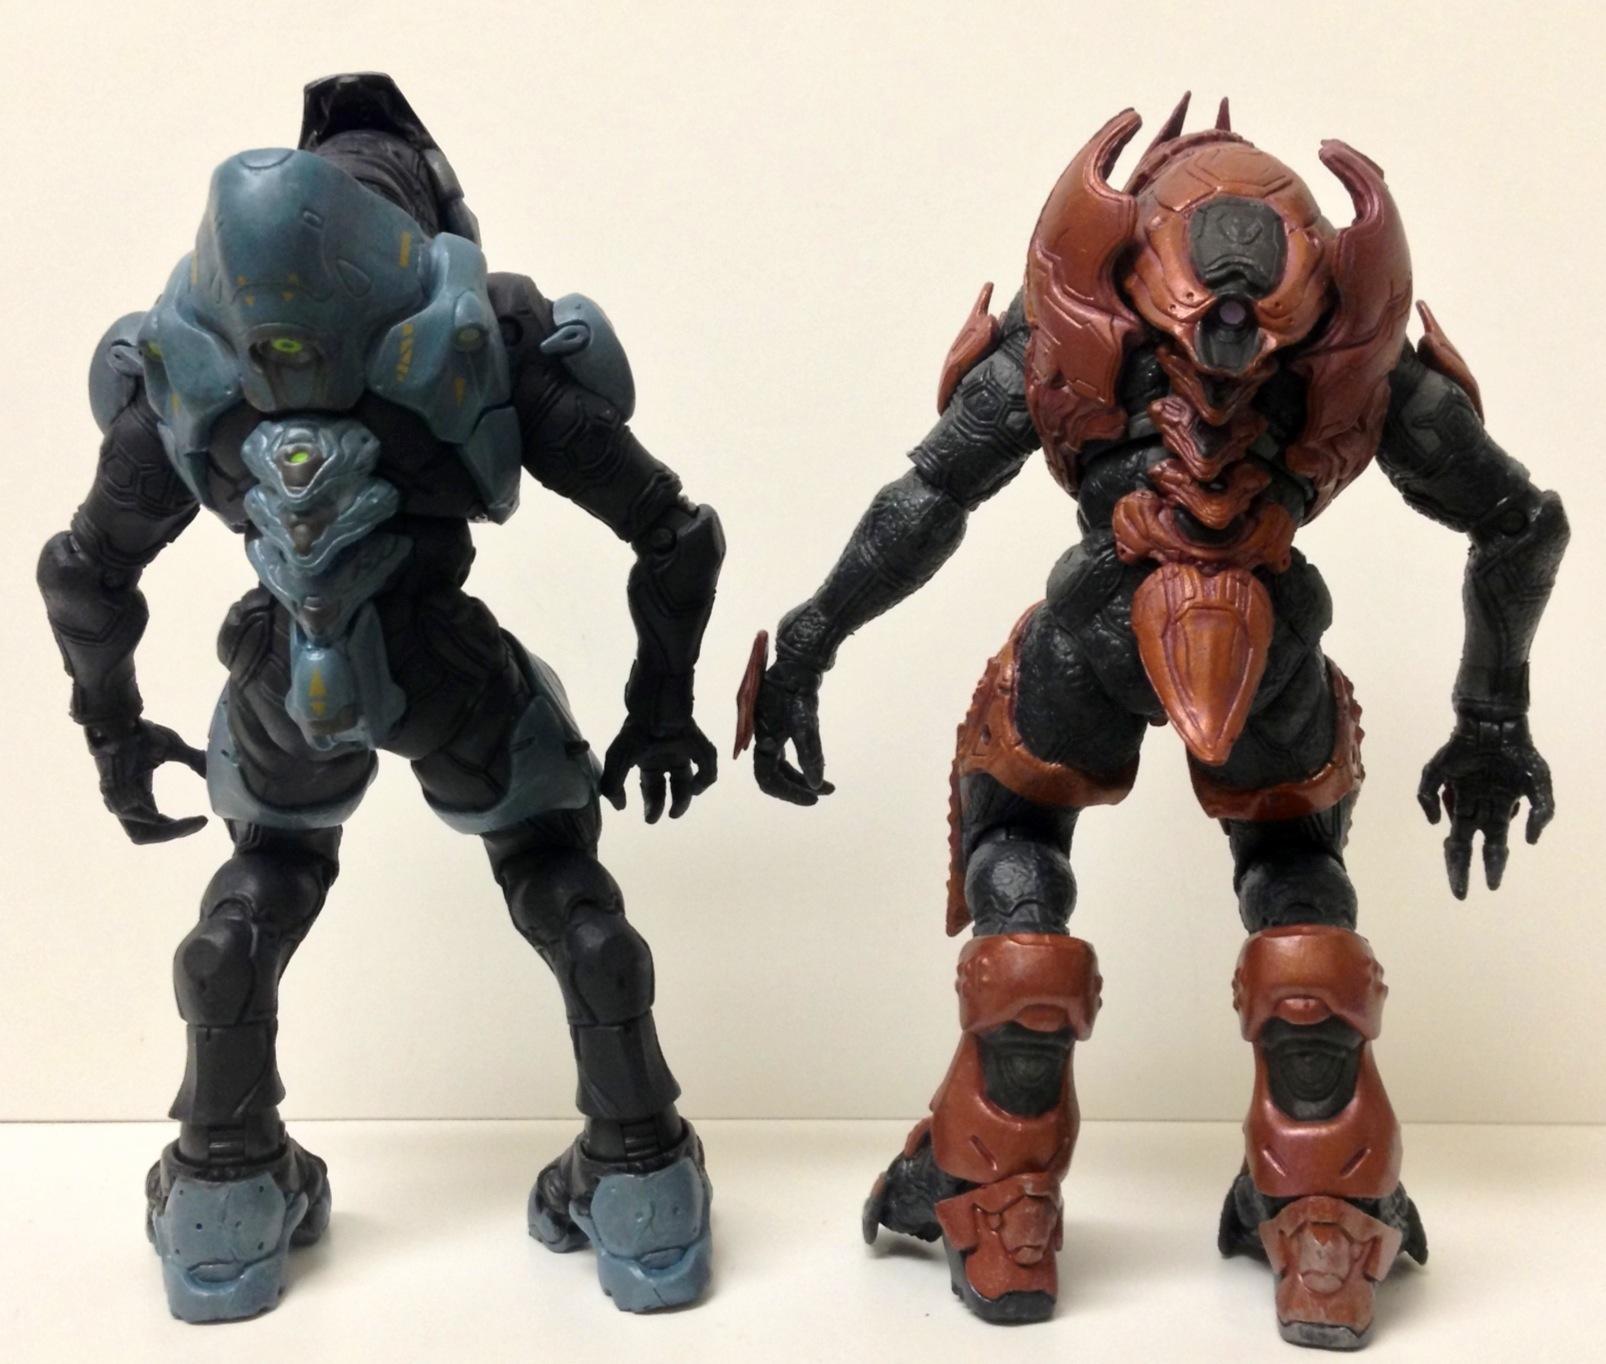 Halo 3 Elites vs Halo 4 Elites vs Elite Zealot Halo 4